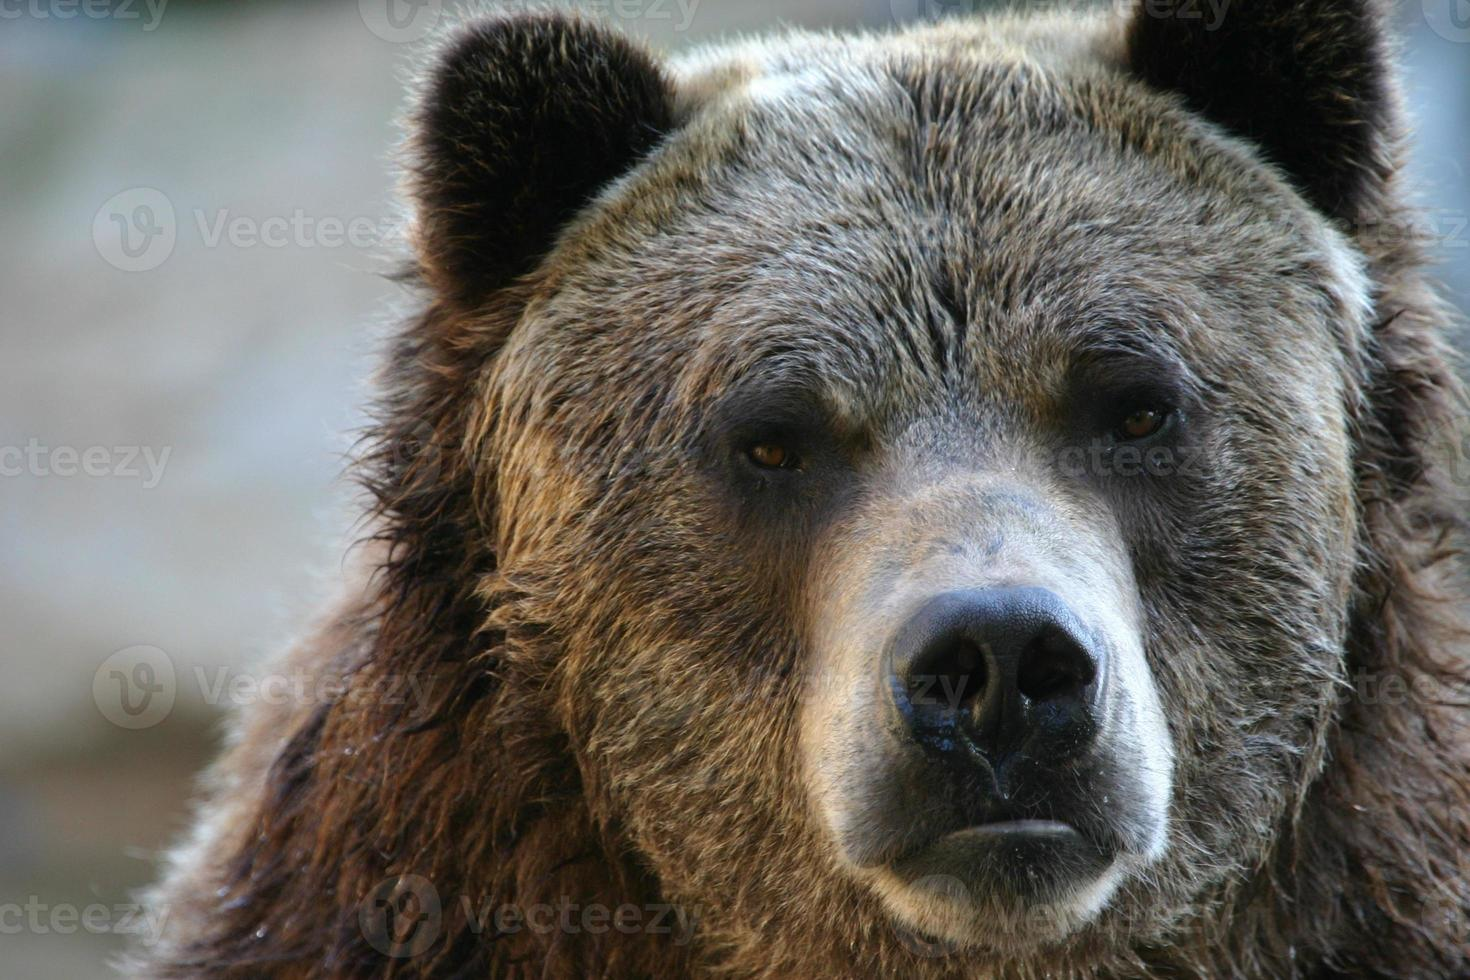 Grizzly bear portrait photo